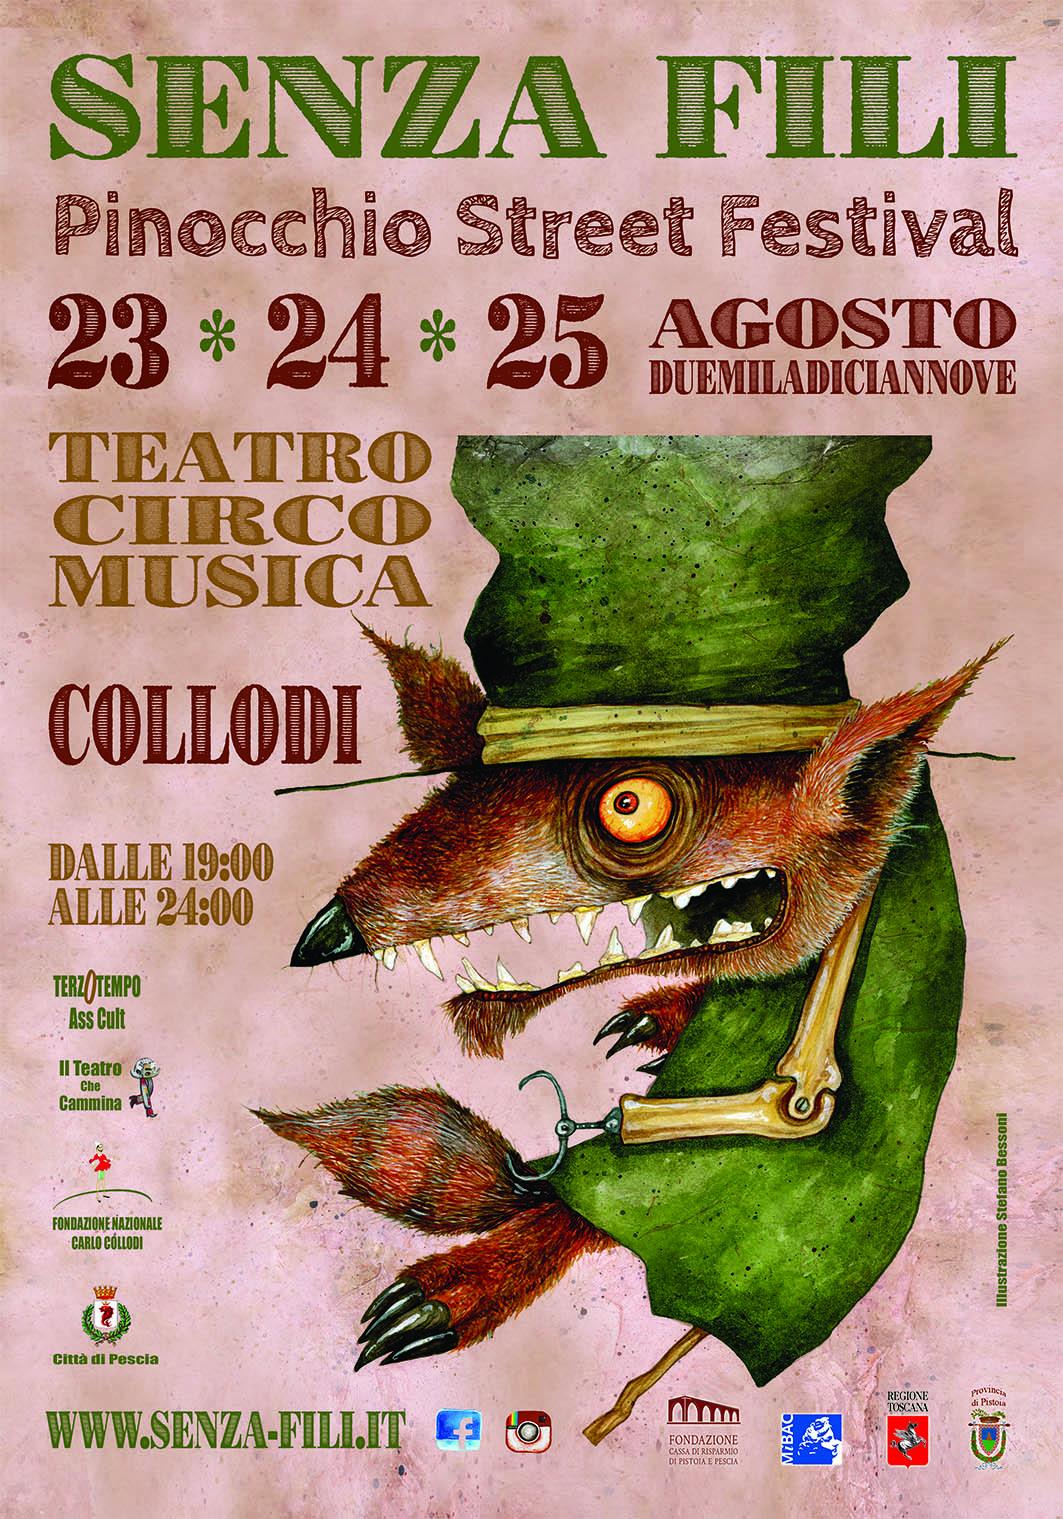 Pinocchio street festival